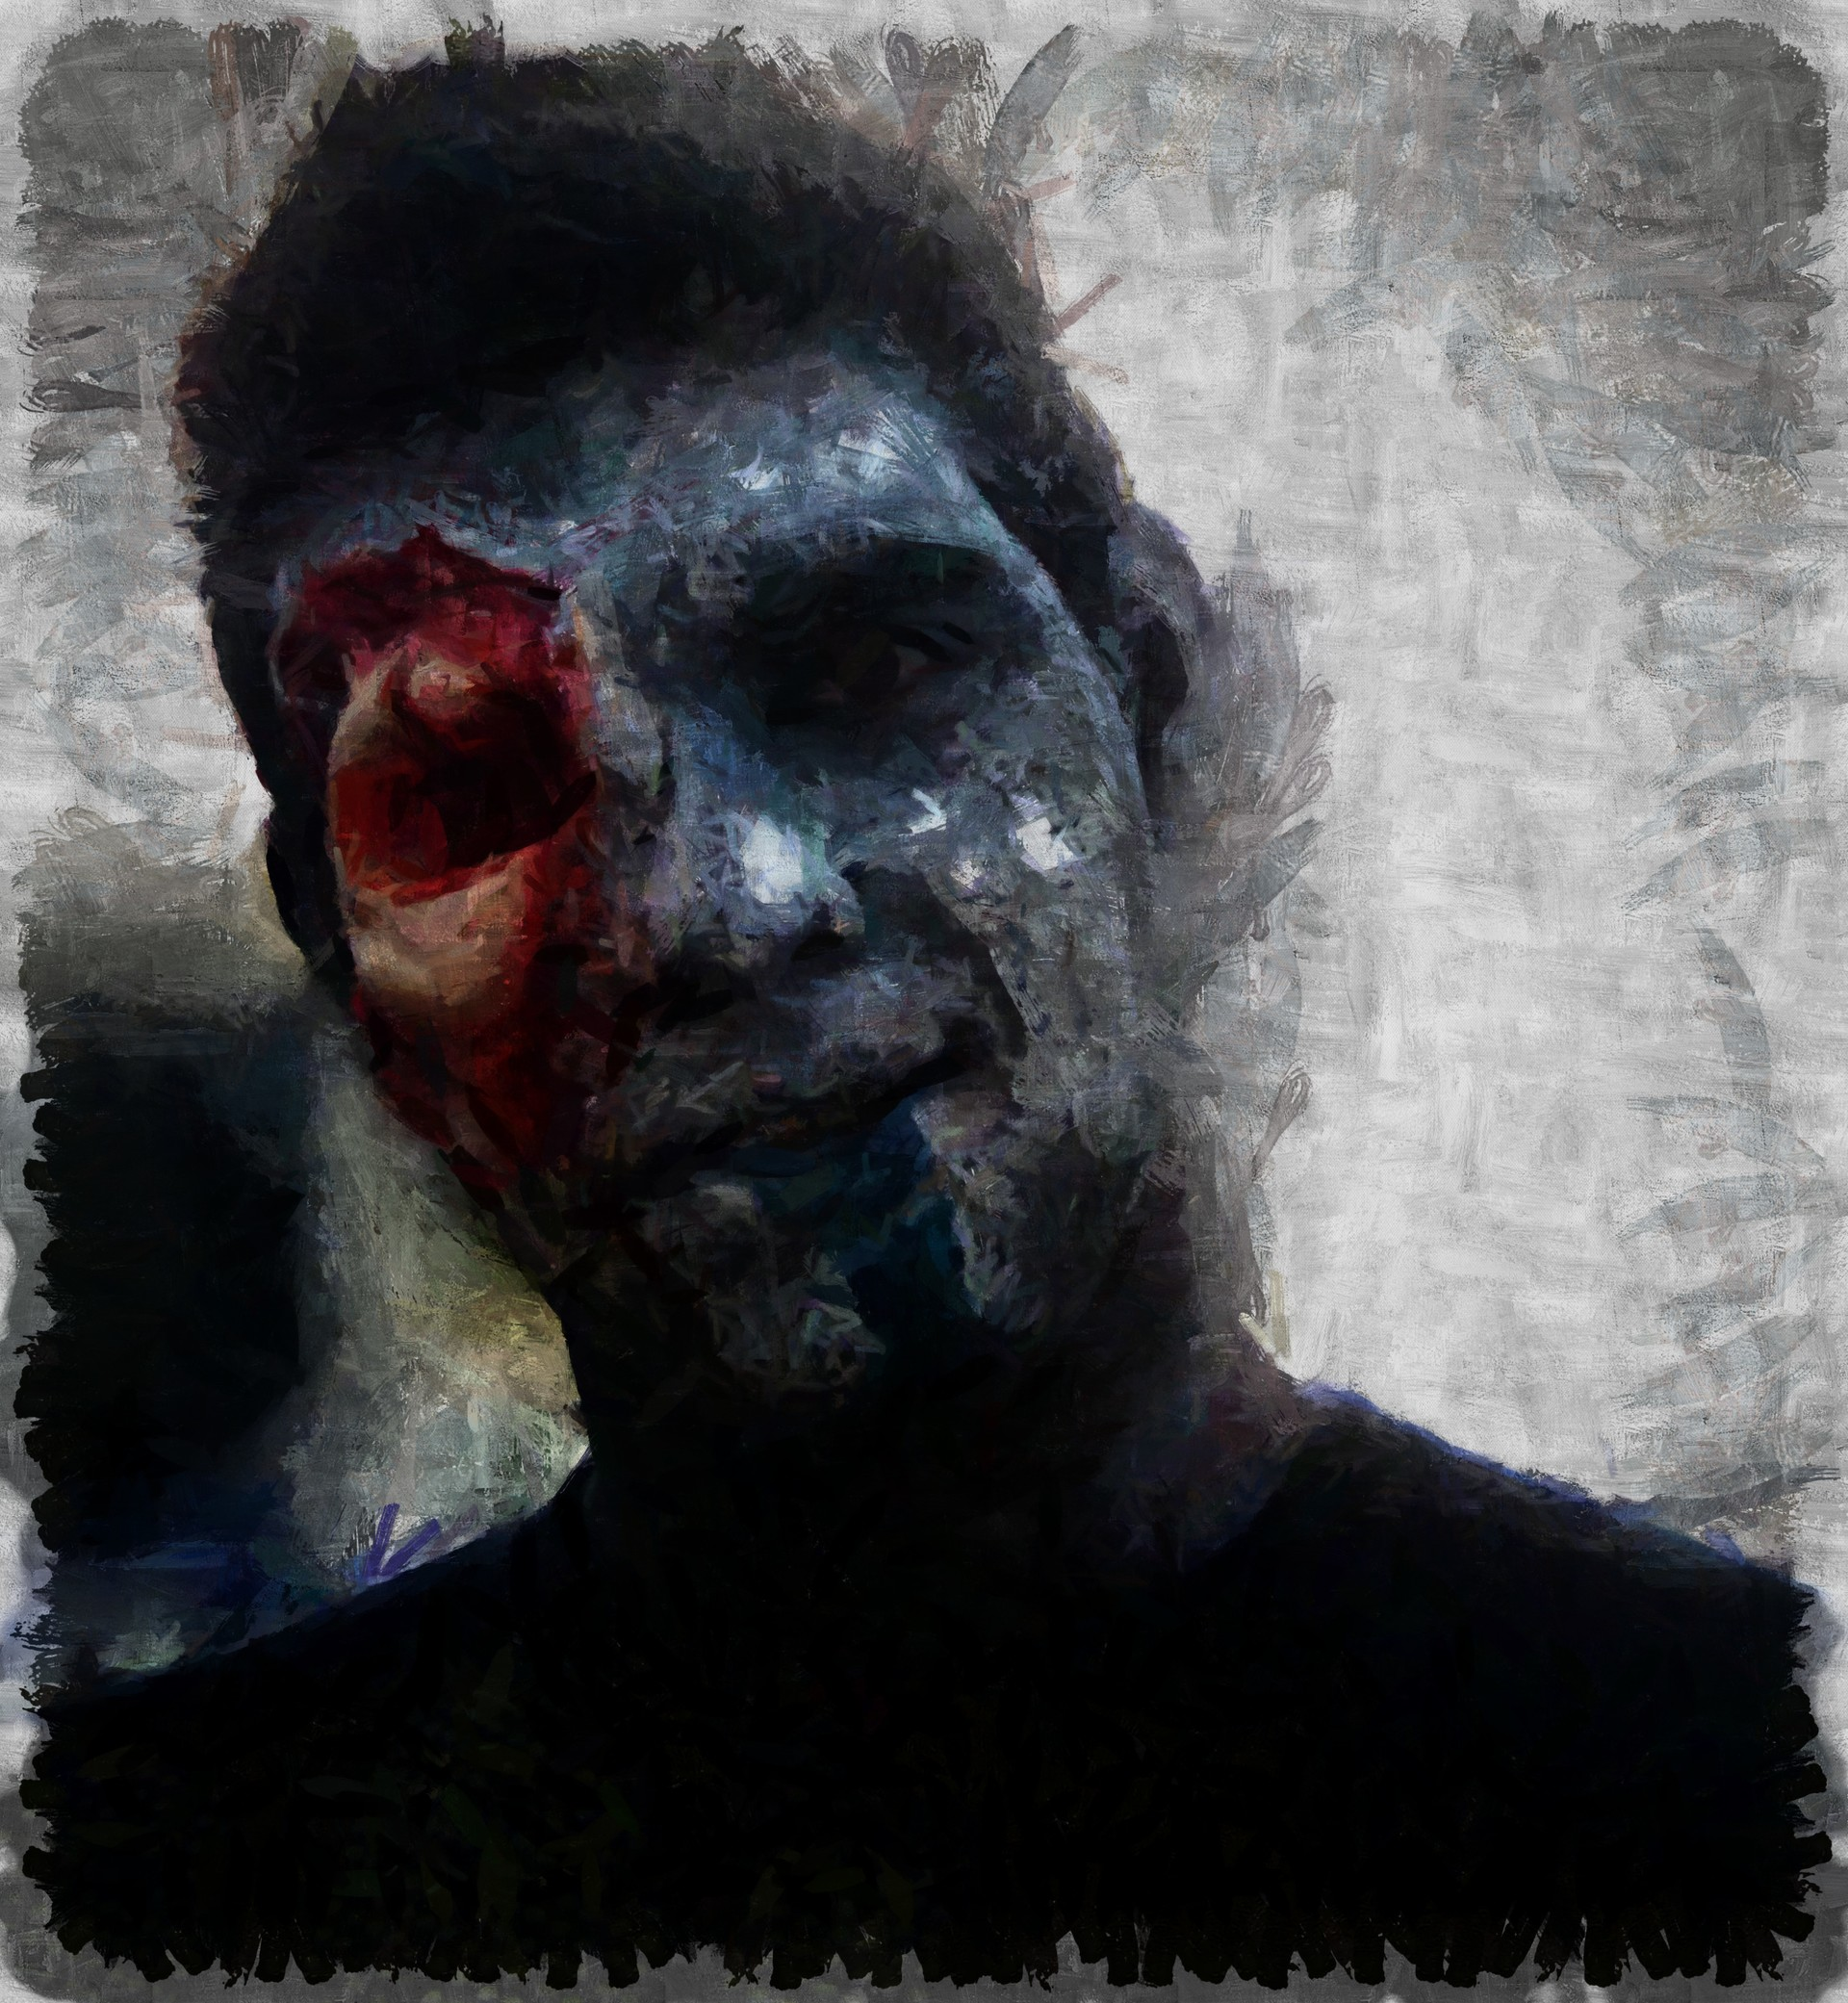 Allan Davis Eye Zombie Img 0811slcz Dap X Zombify